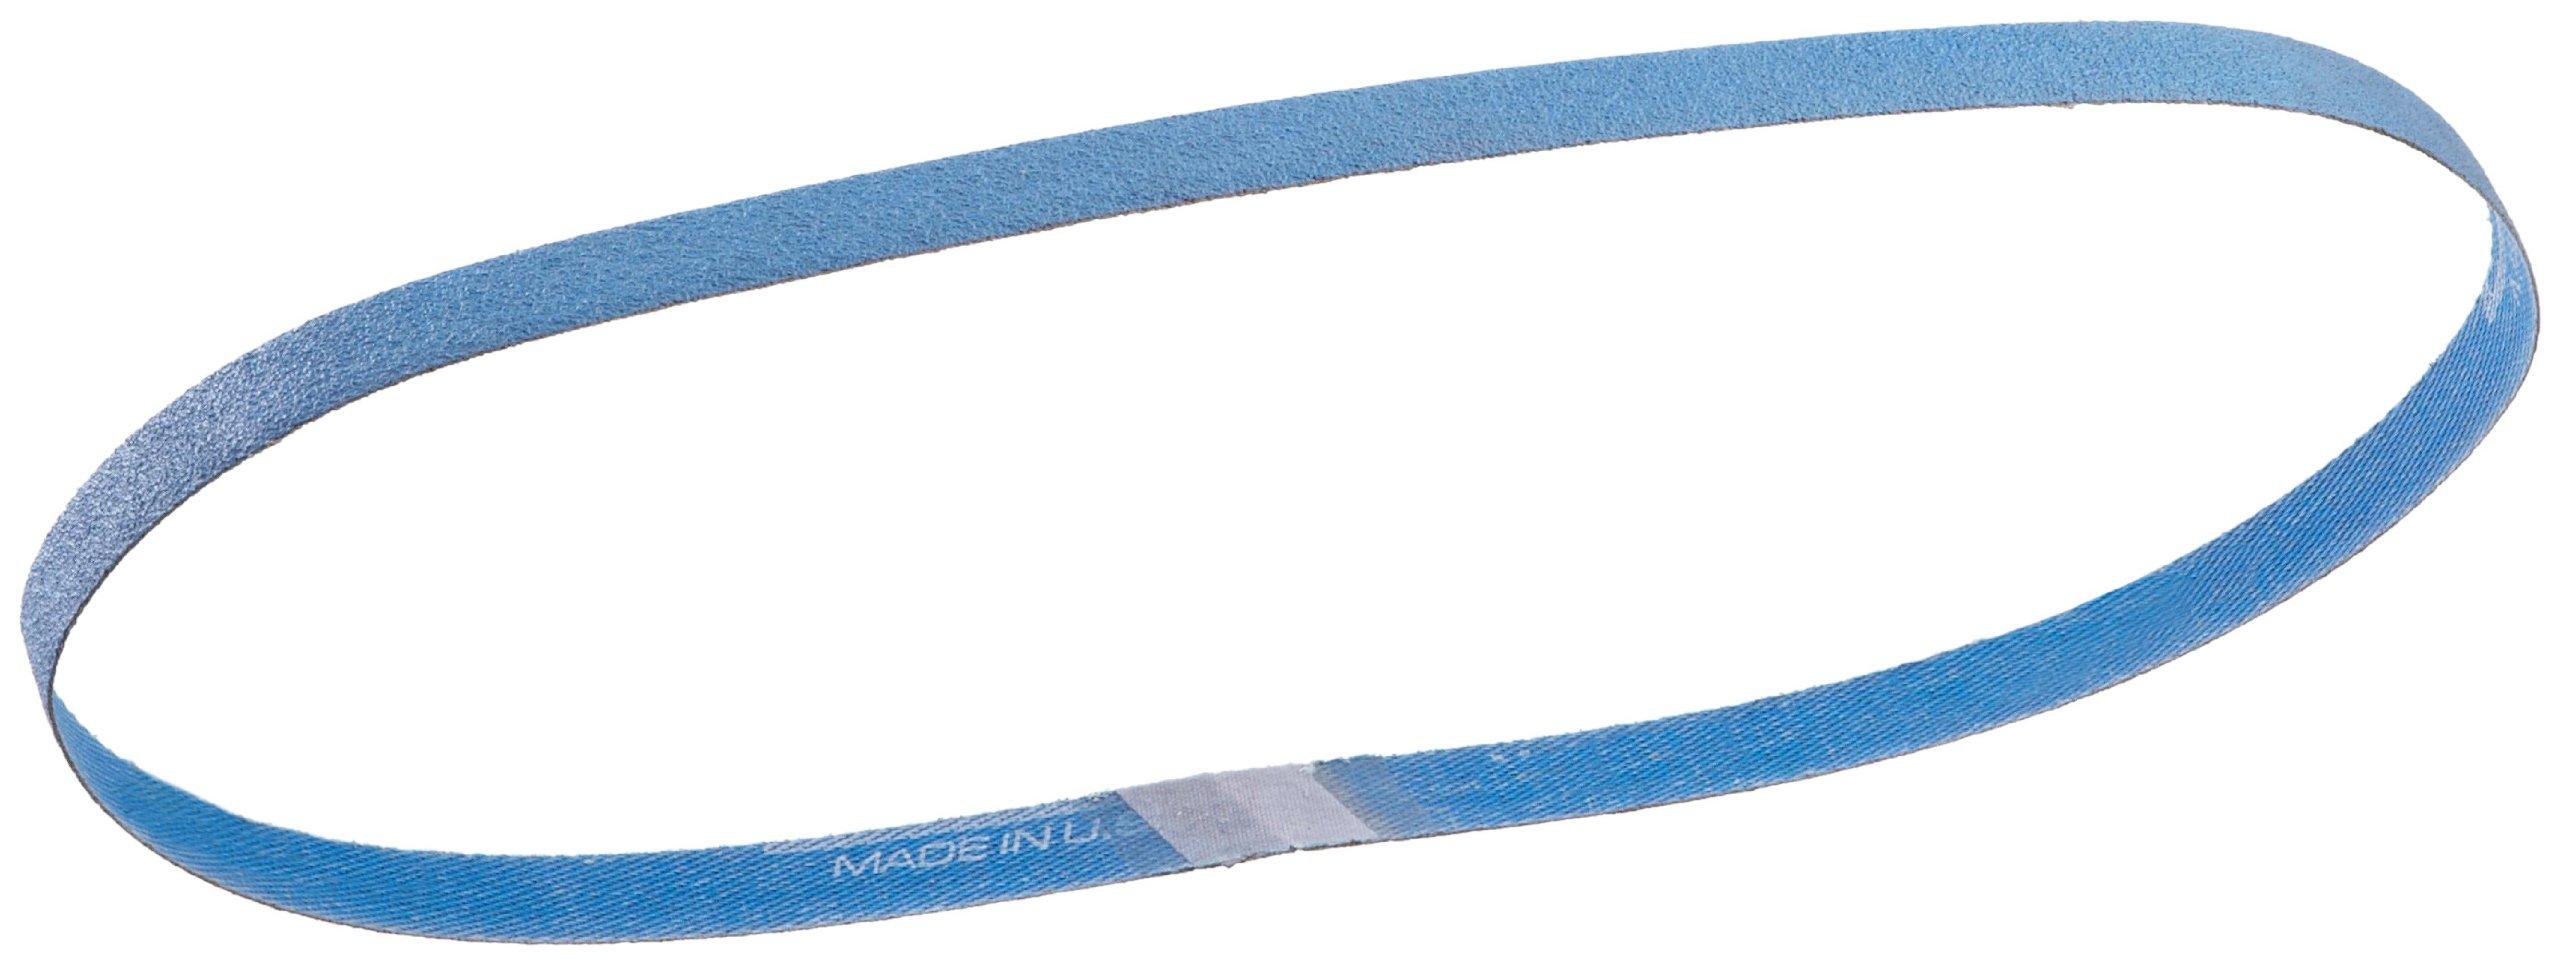 Norton BlueFire R823P File Abrasive Belt, Waterproof, Polyester Backing, Zirconia Alumina, 3/8'' Width, 13'' Length, Grit 60 (Pack of 50)